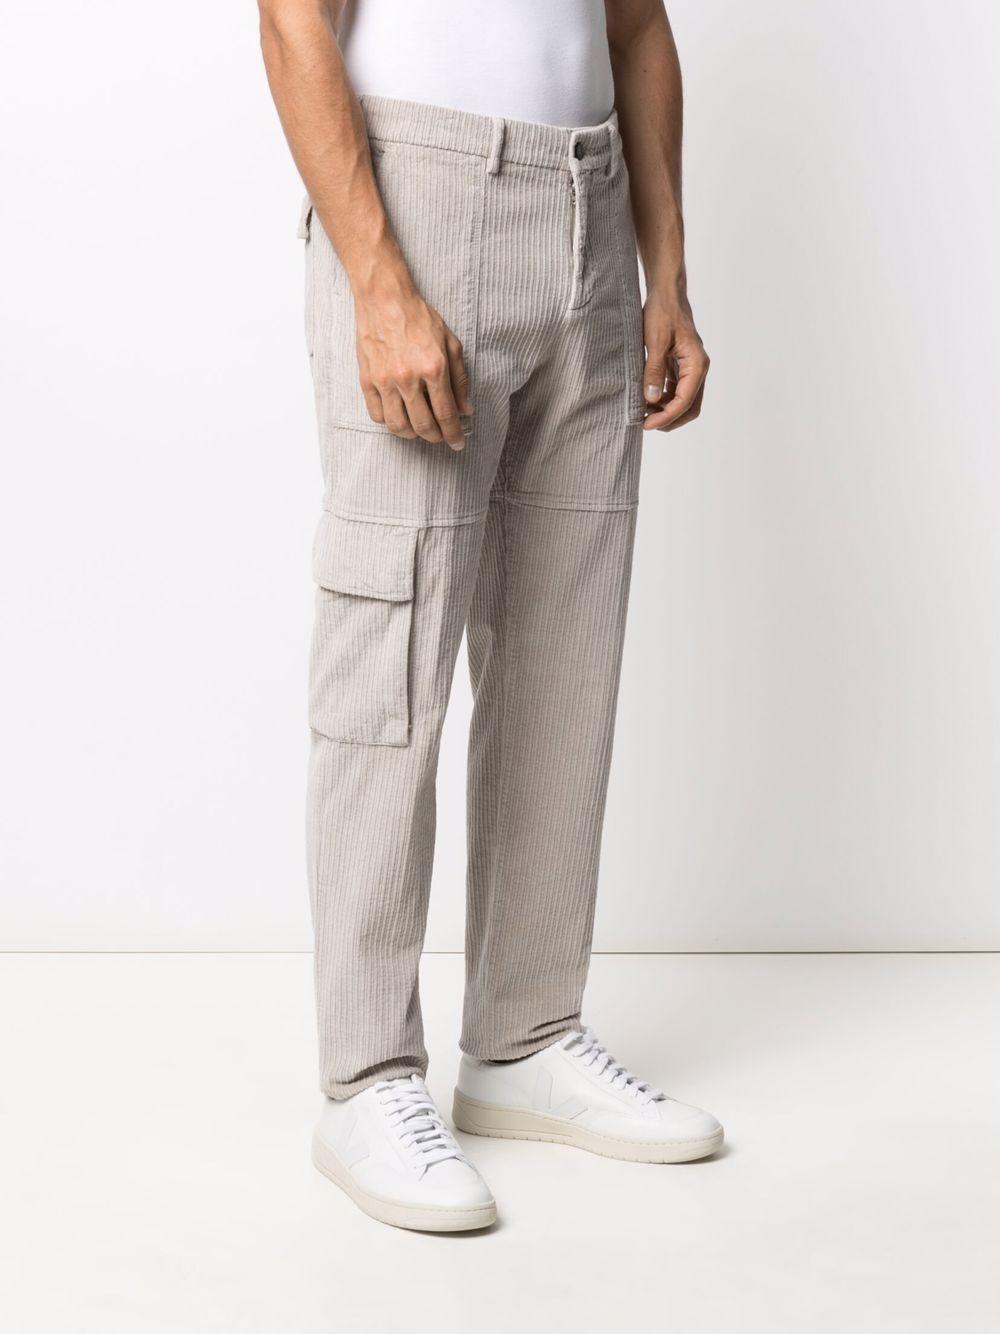 Pantaloni cargo in velluto a coste di cotone stretch sabbia ELEVENTY | Pantaloni | D75PAND04-TET0D00302